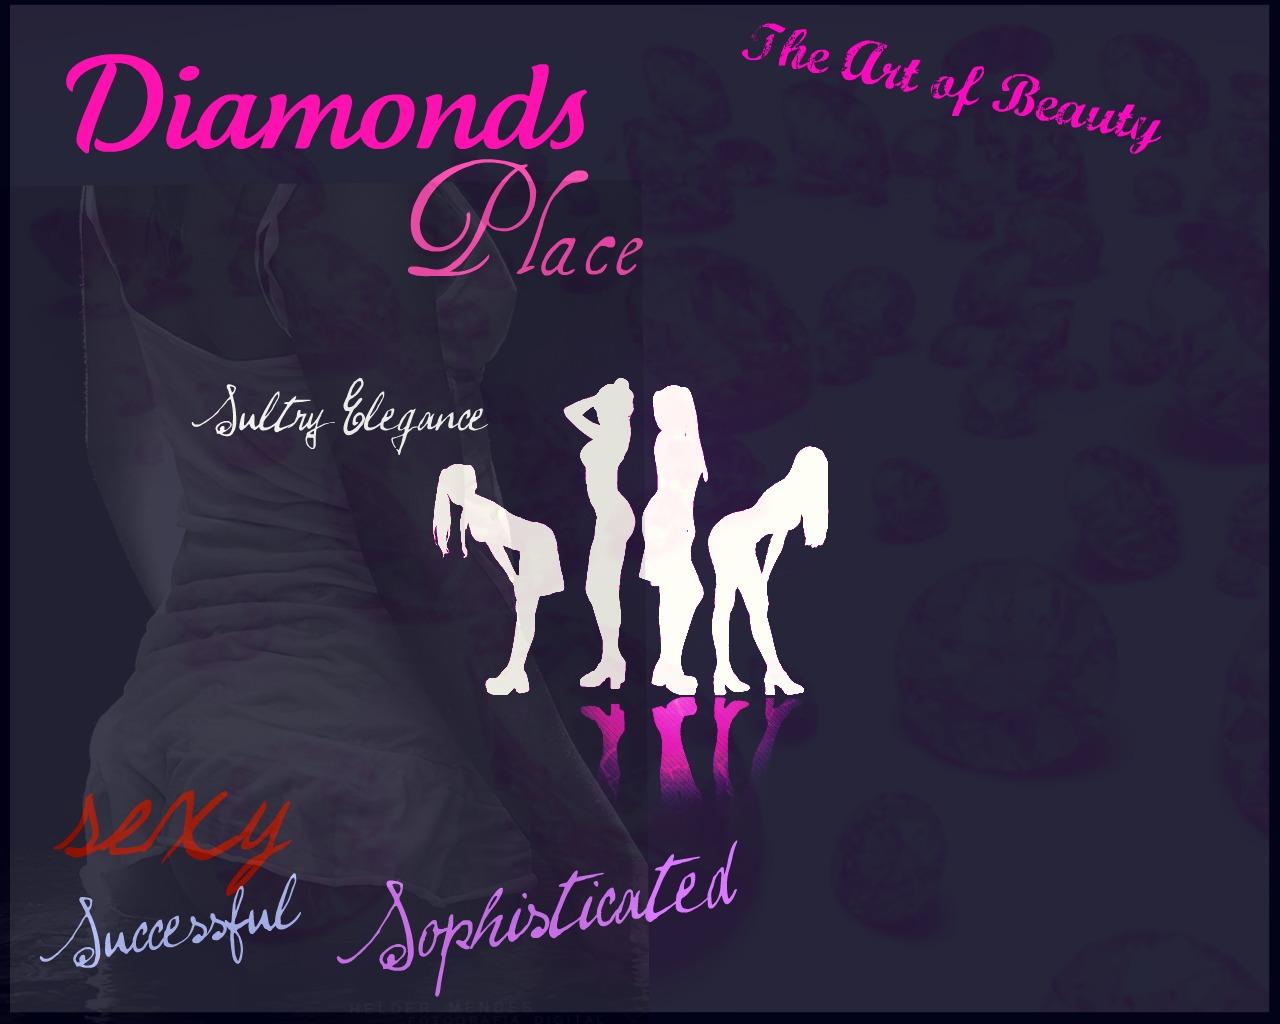 http://3.bp.blogspot.com/-djnp4s9Tb9s/ThD5z7nxw8I/AAAAAAAAARc/6BNdn6ACJpo/s1600/diamonds+place.jpg